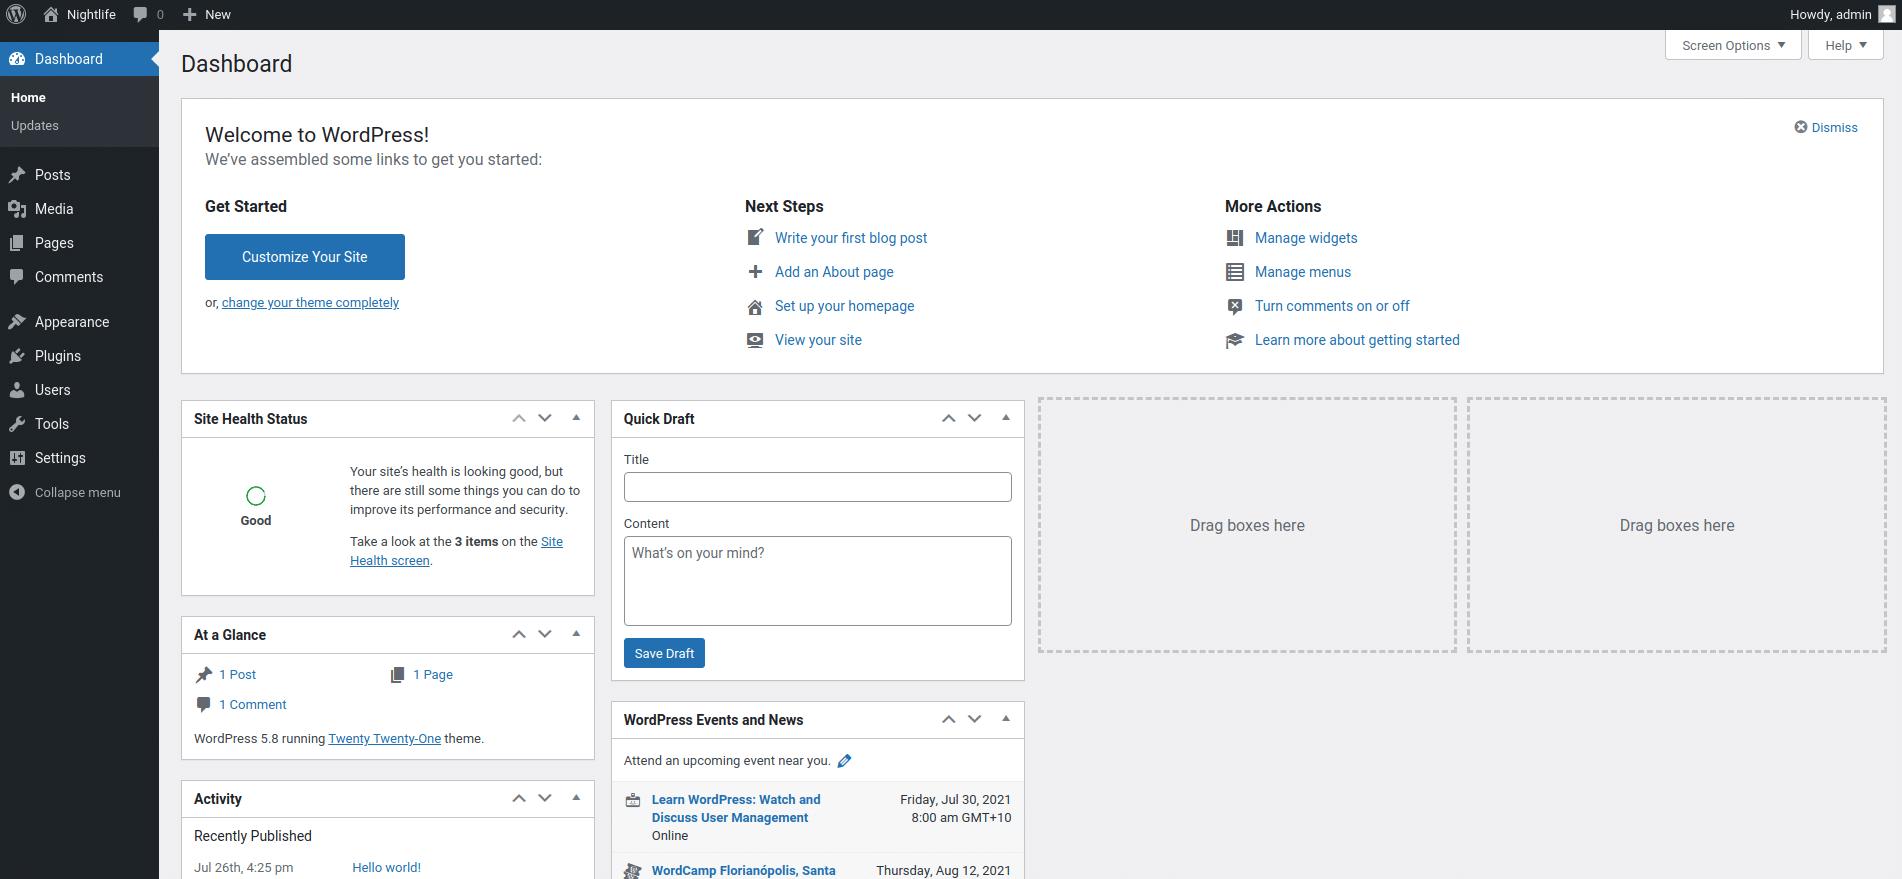 Login to your WordPress dashboard to add new plugins.